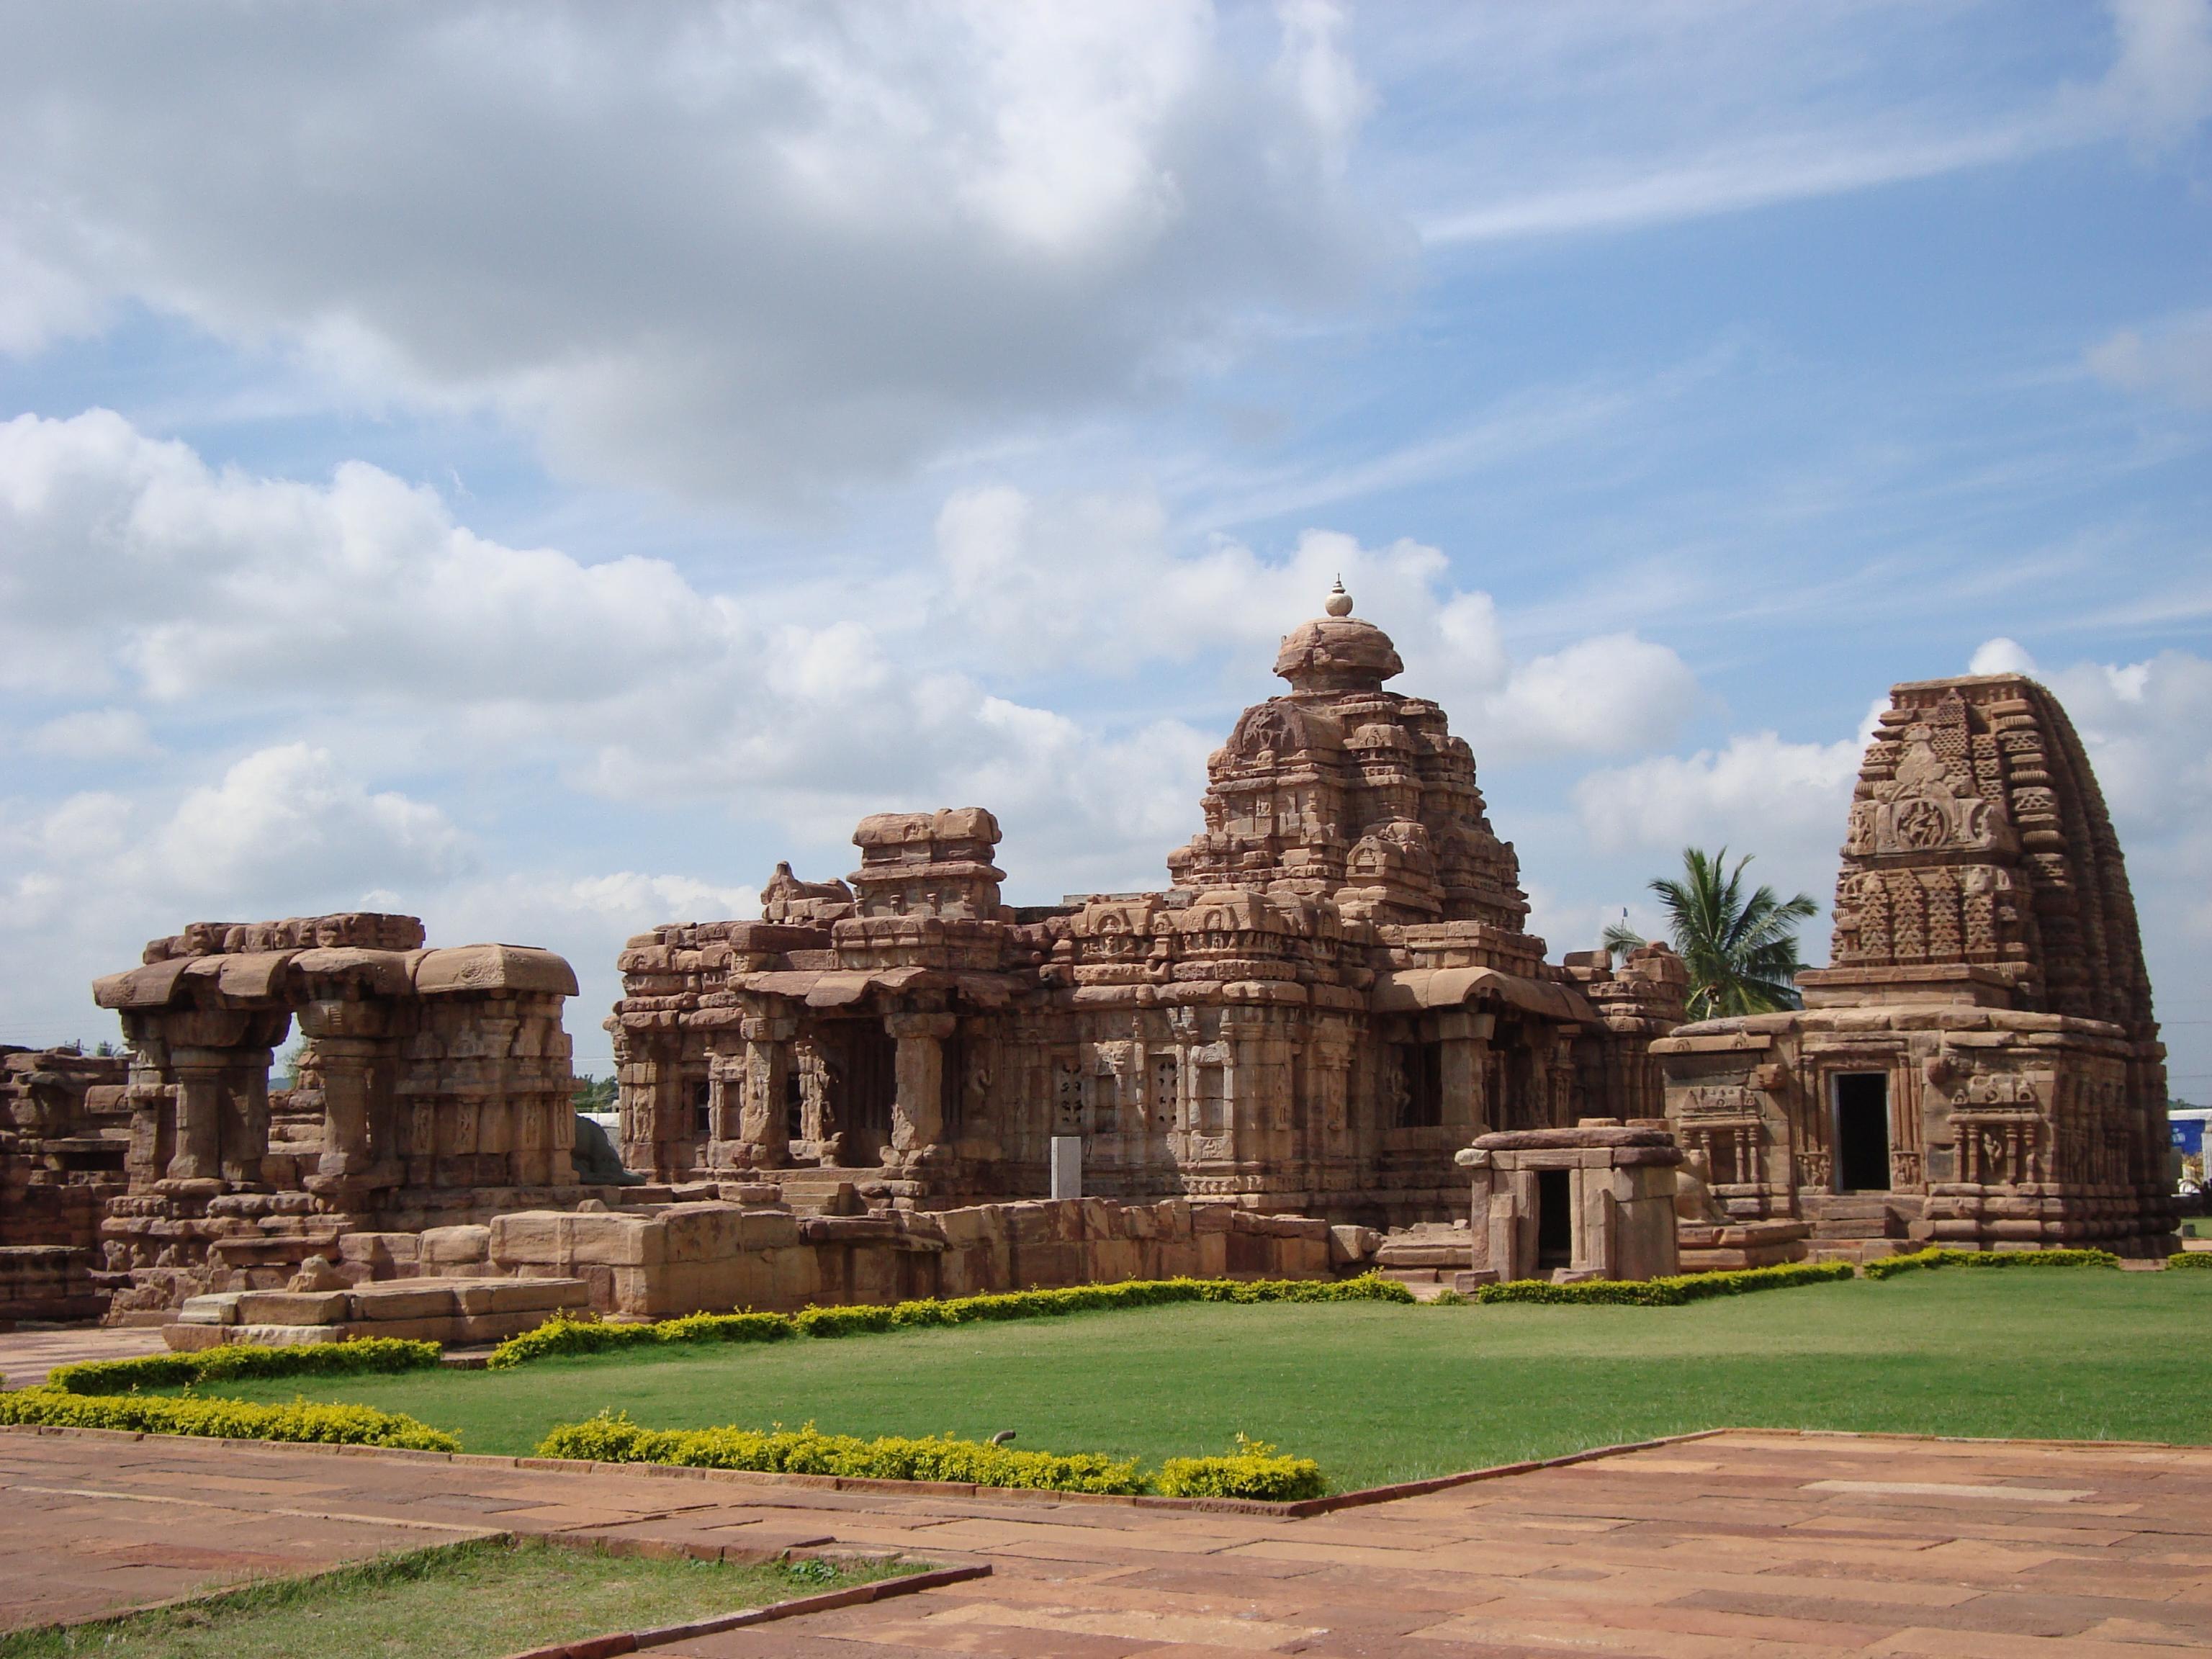 Mallikarjuna and Kasivisvanatha temples at Pattadakal, built 740 CE